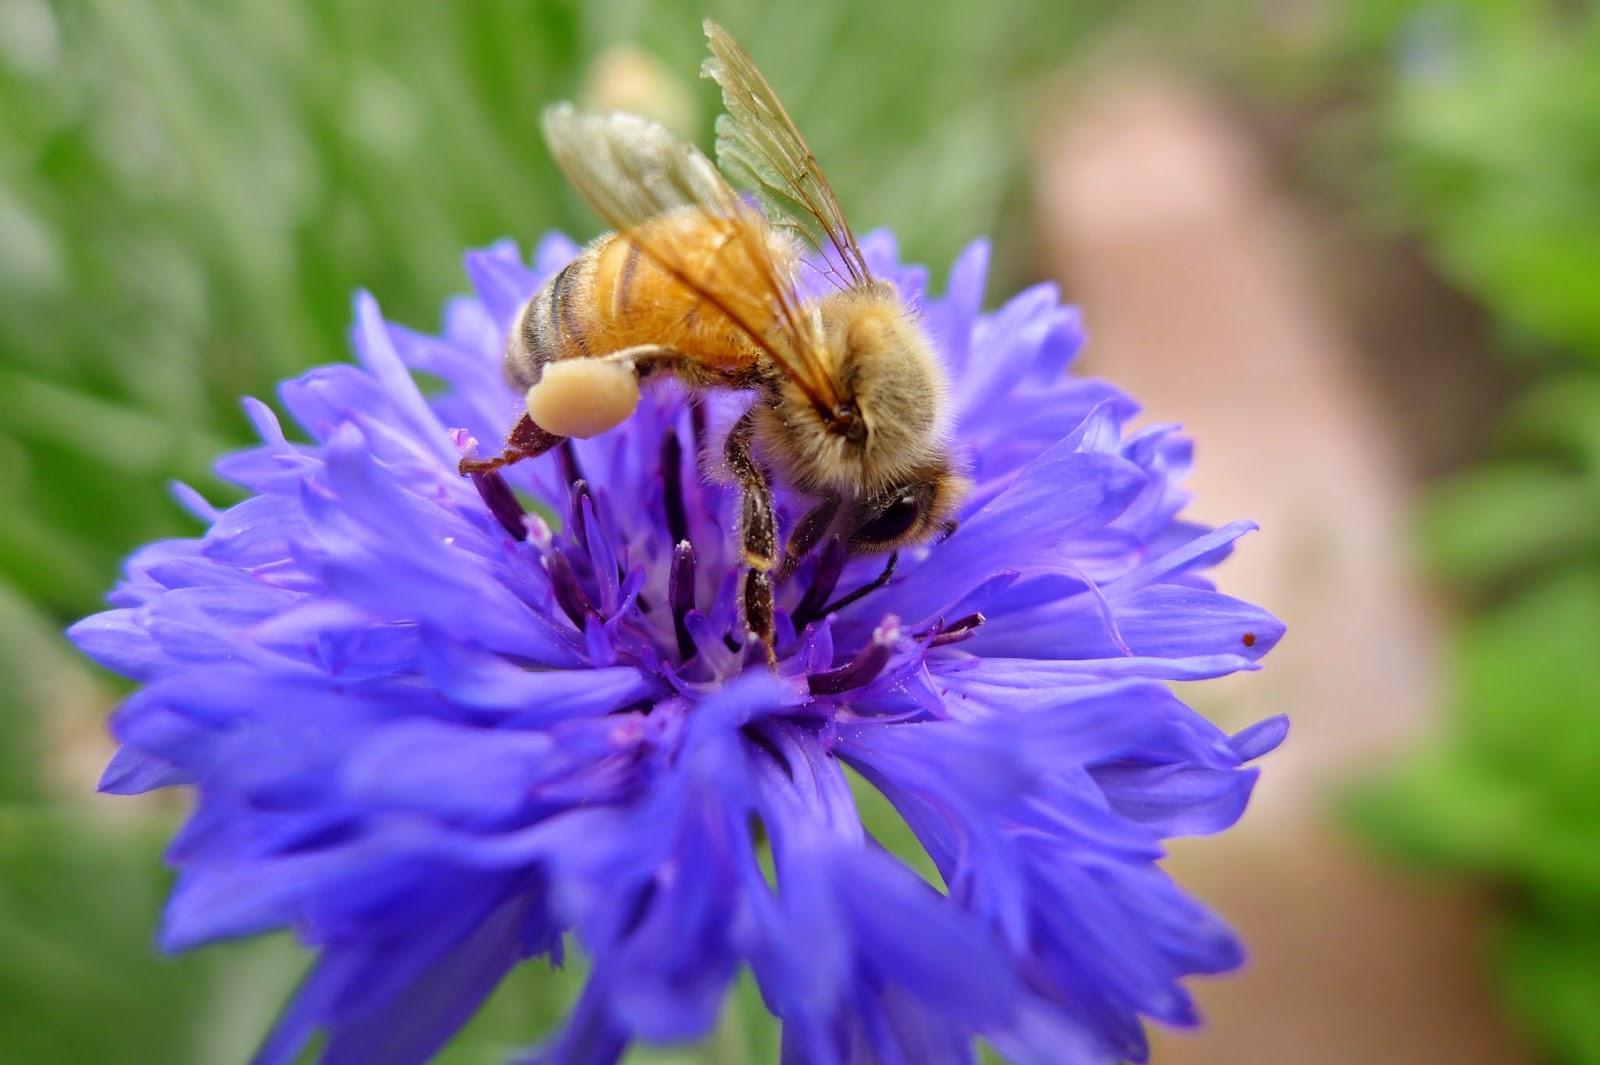 Honey Bee, bees, pollinators, urban farming